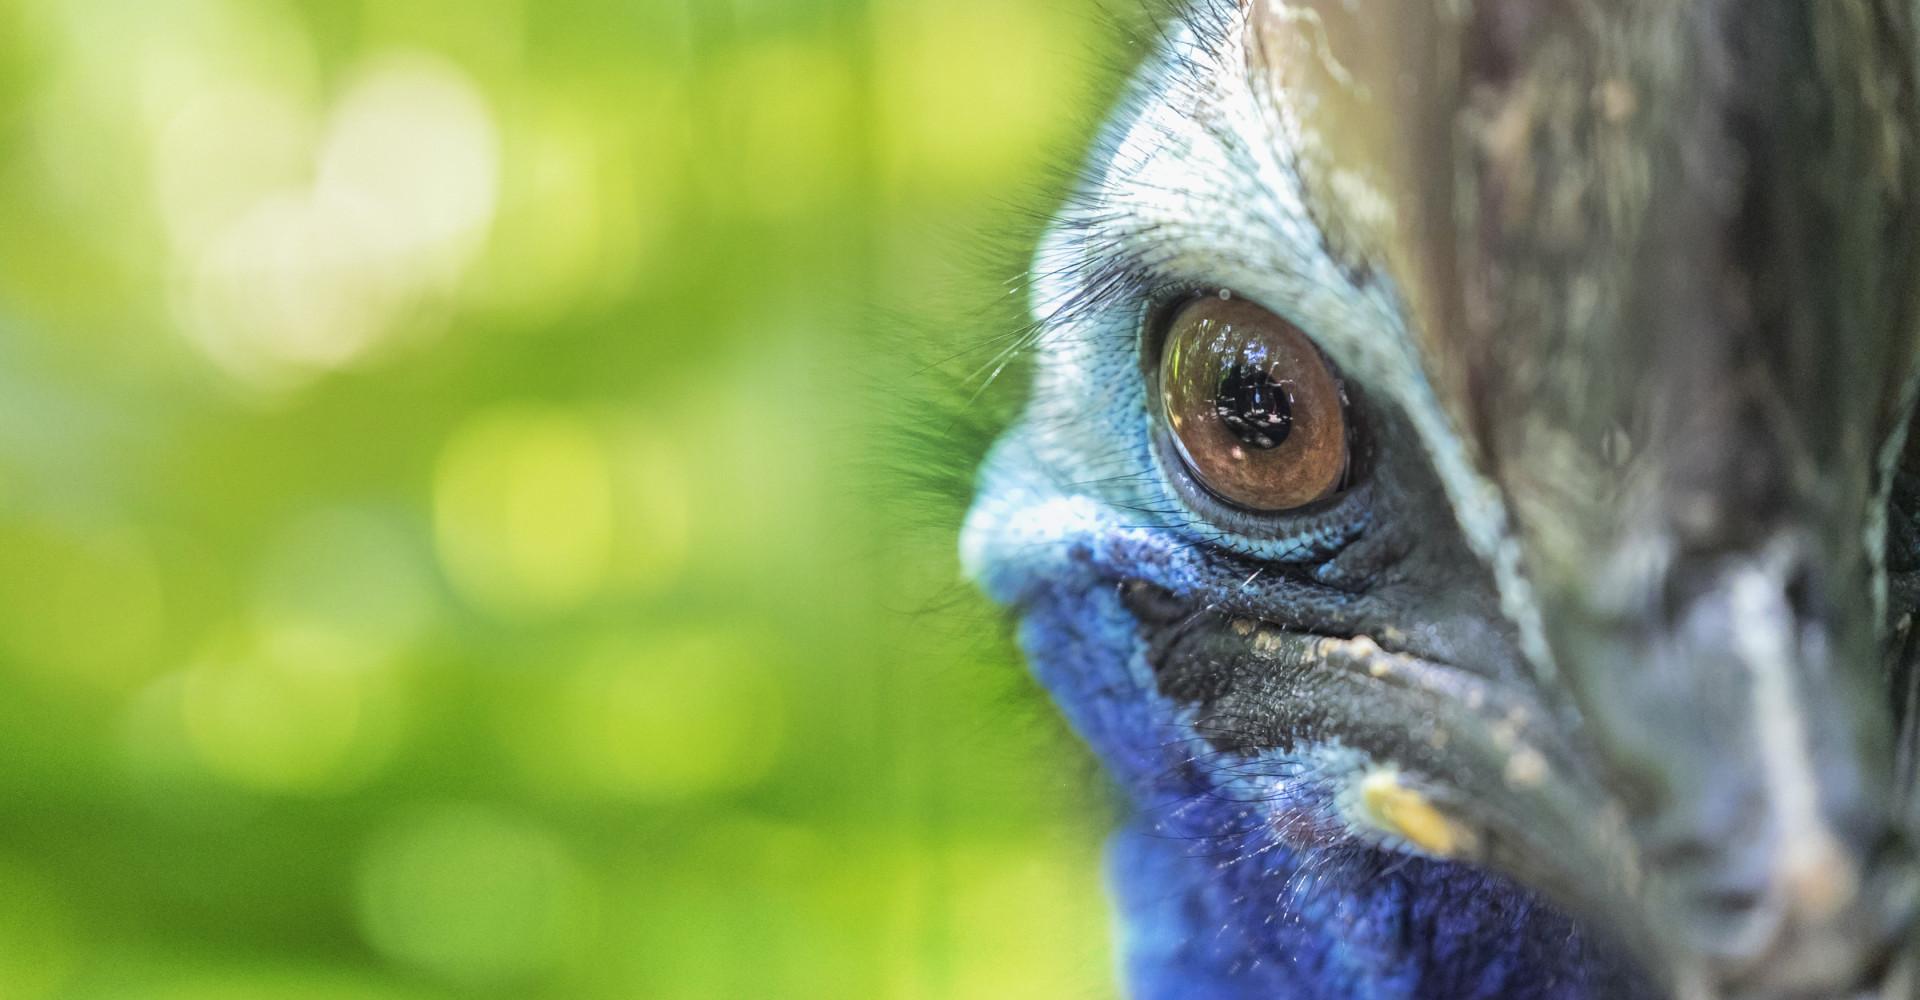 Australia's endangered animals